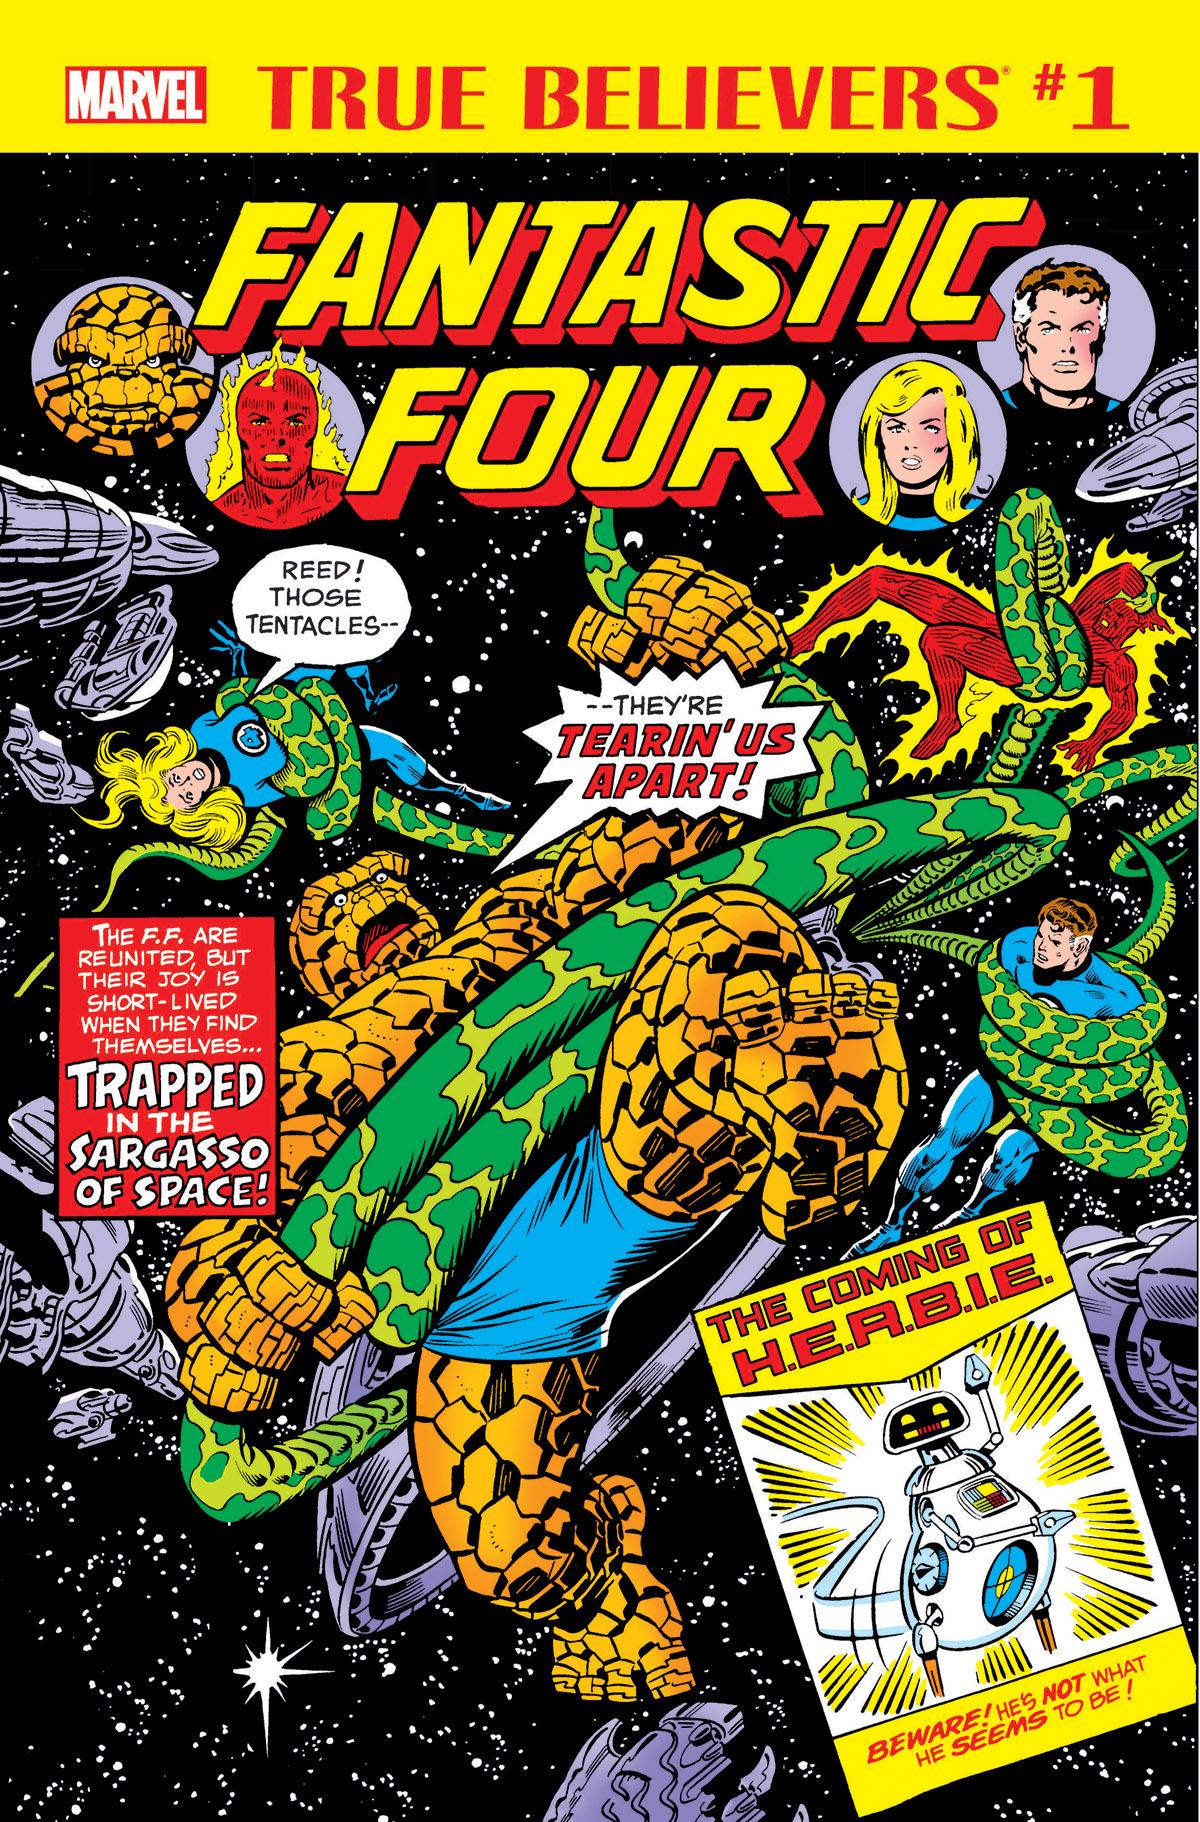 True Believers: Fantastic Four - The Coming of H.E.R.B.I.E. (2018) #1